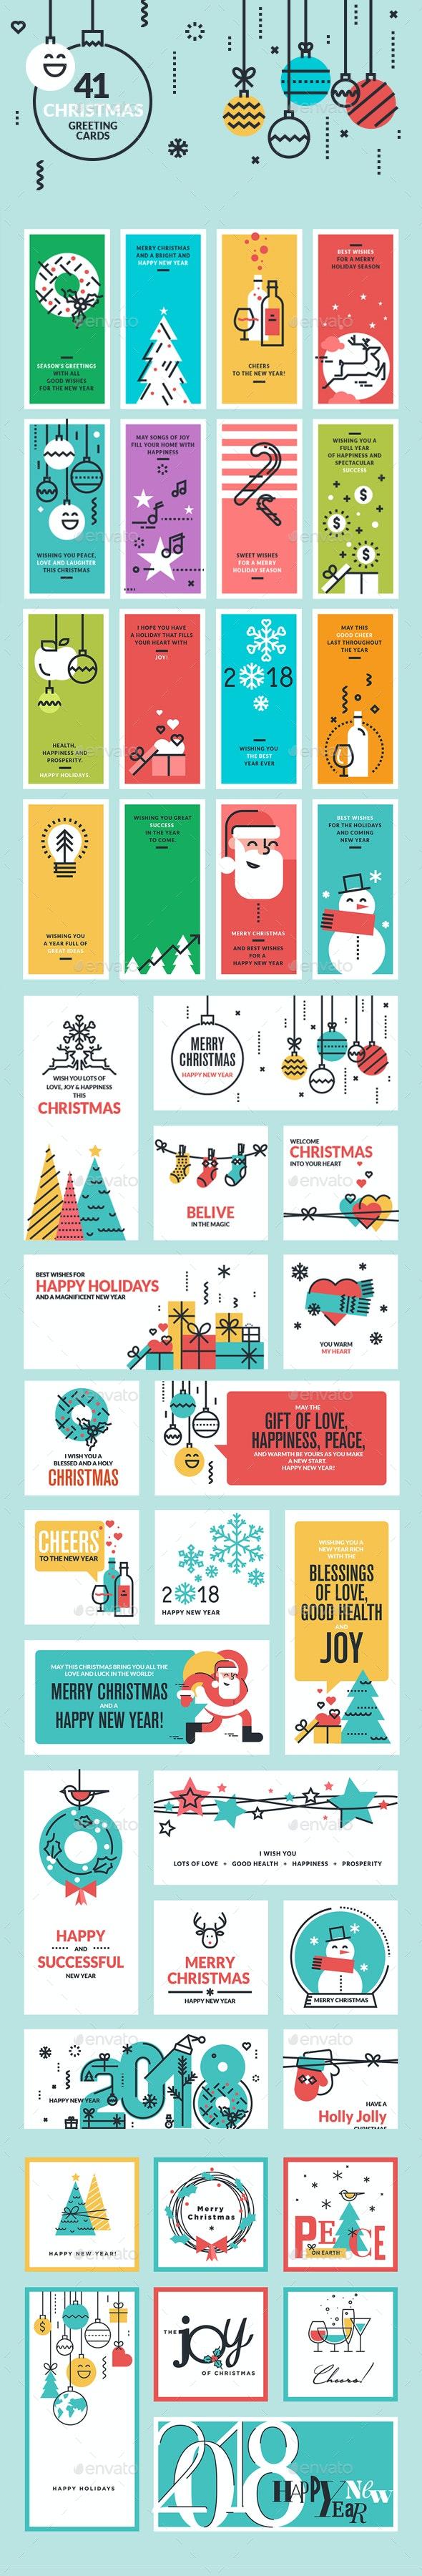 2018 Christmas and New Year Greeting Cards and Banners - Christmas Seasons/Holidays